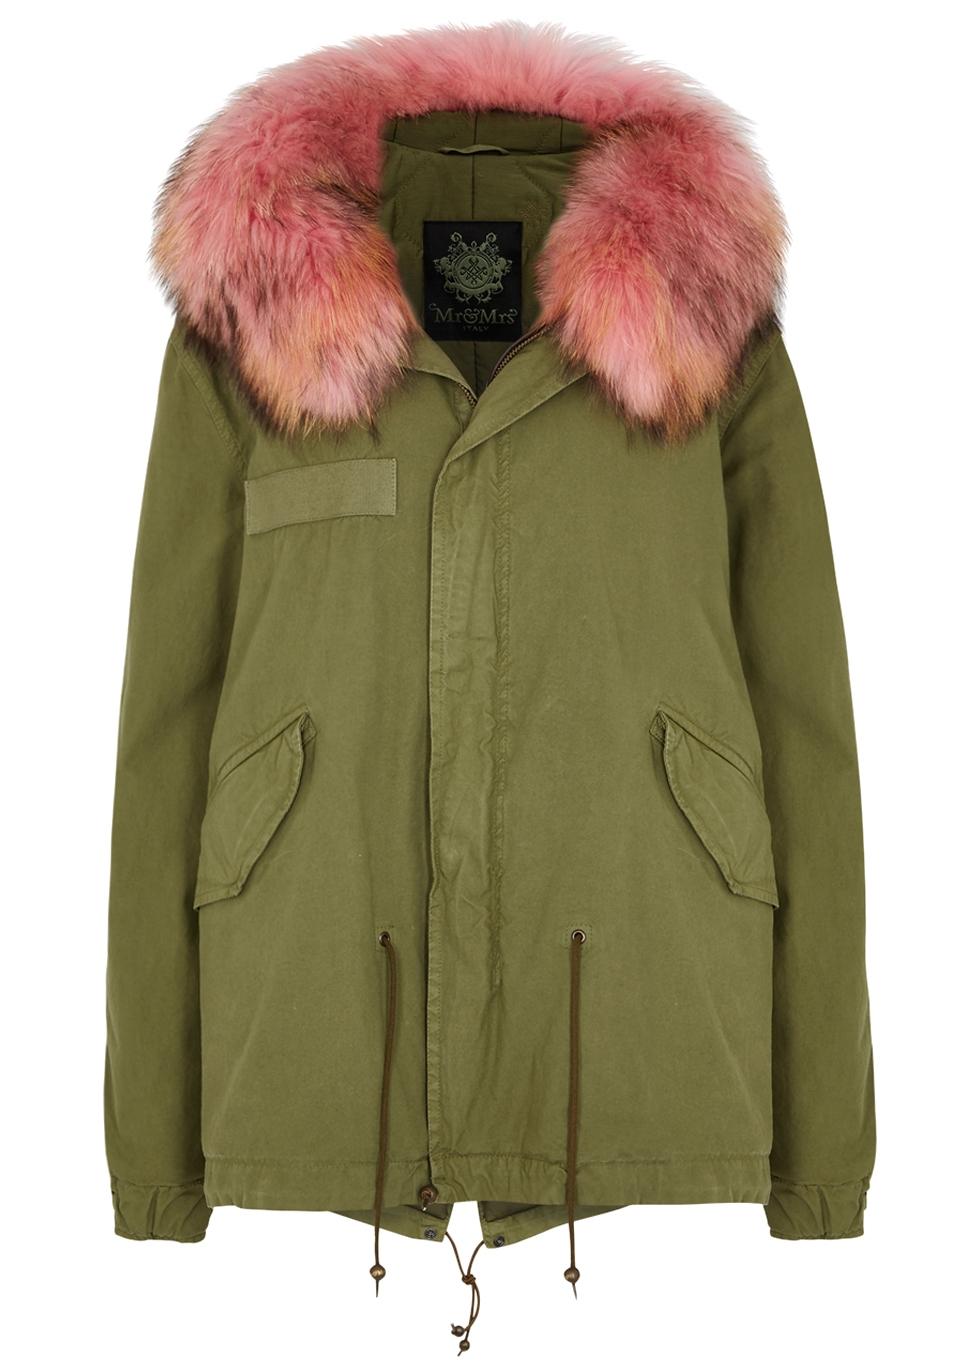 95651ceef54 Designer Parkas - Women s Parka Coats - Harvey Nichols